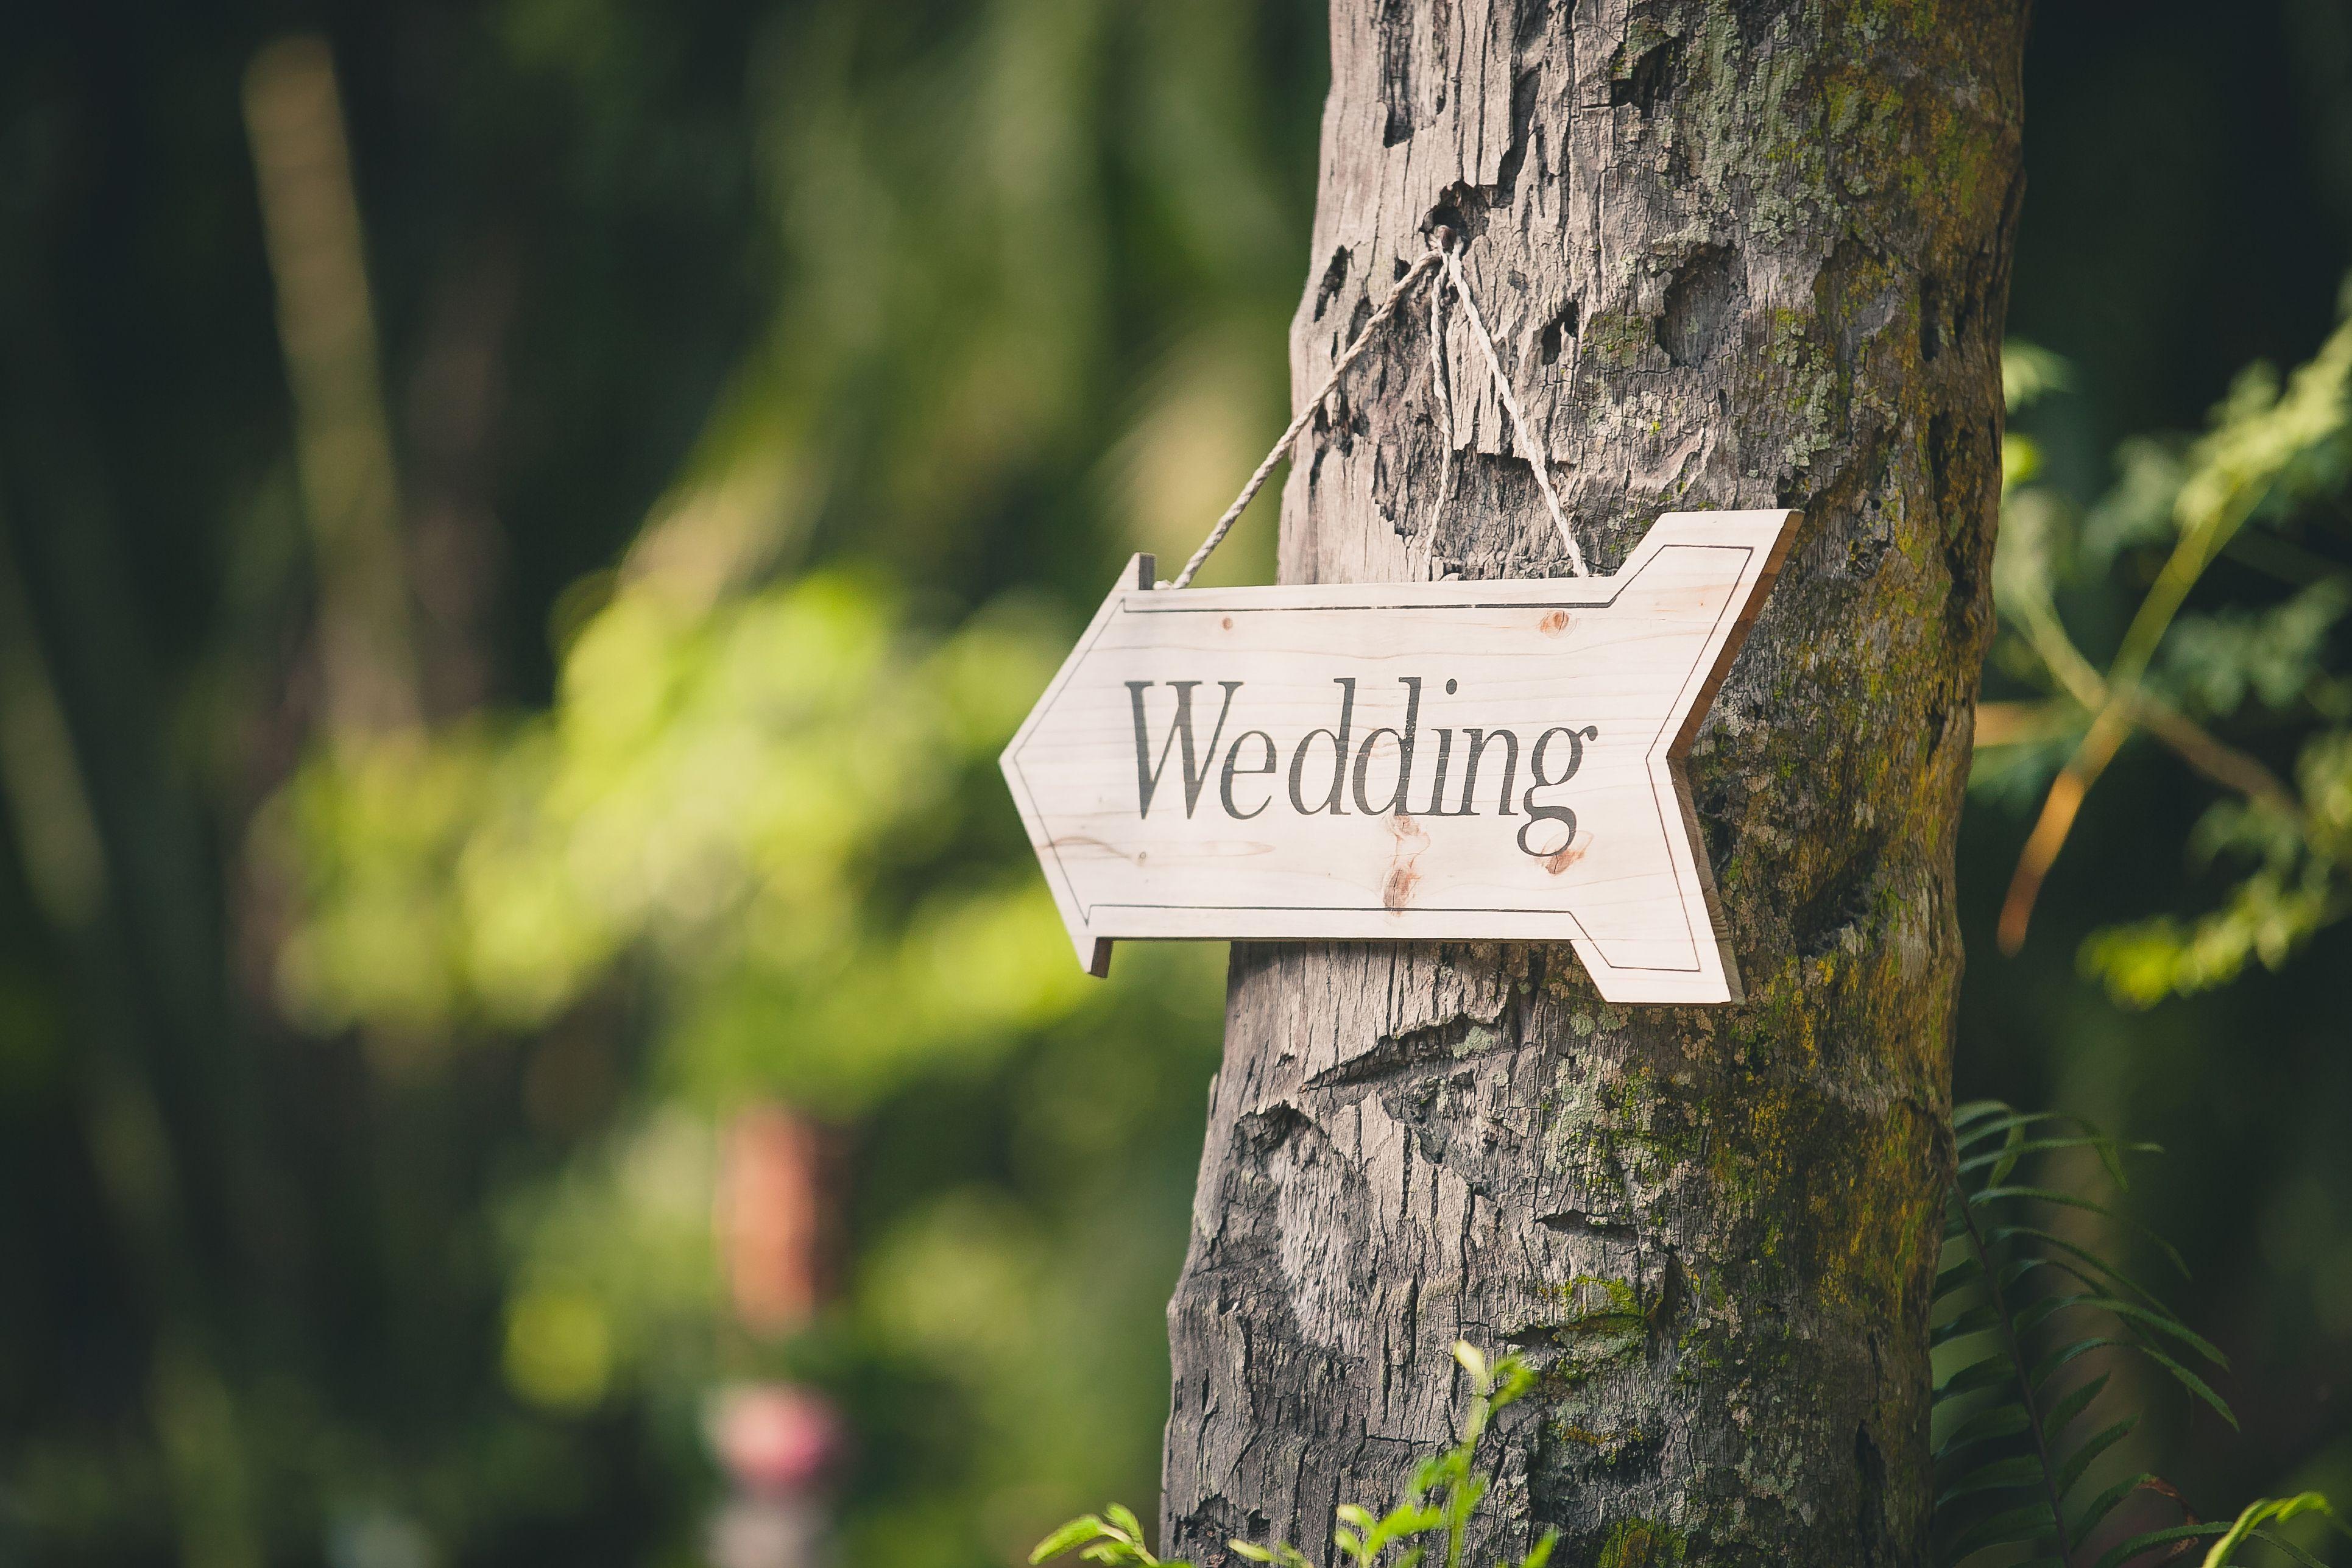 Etsy top wedding trends 2019 revealed